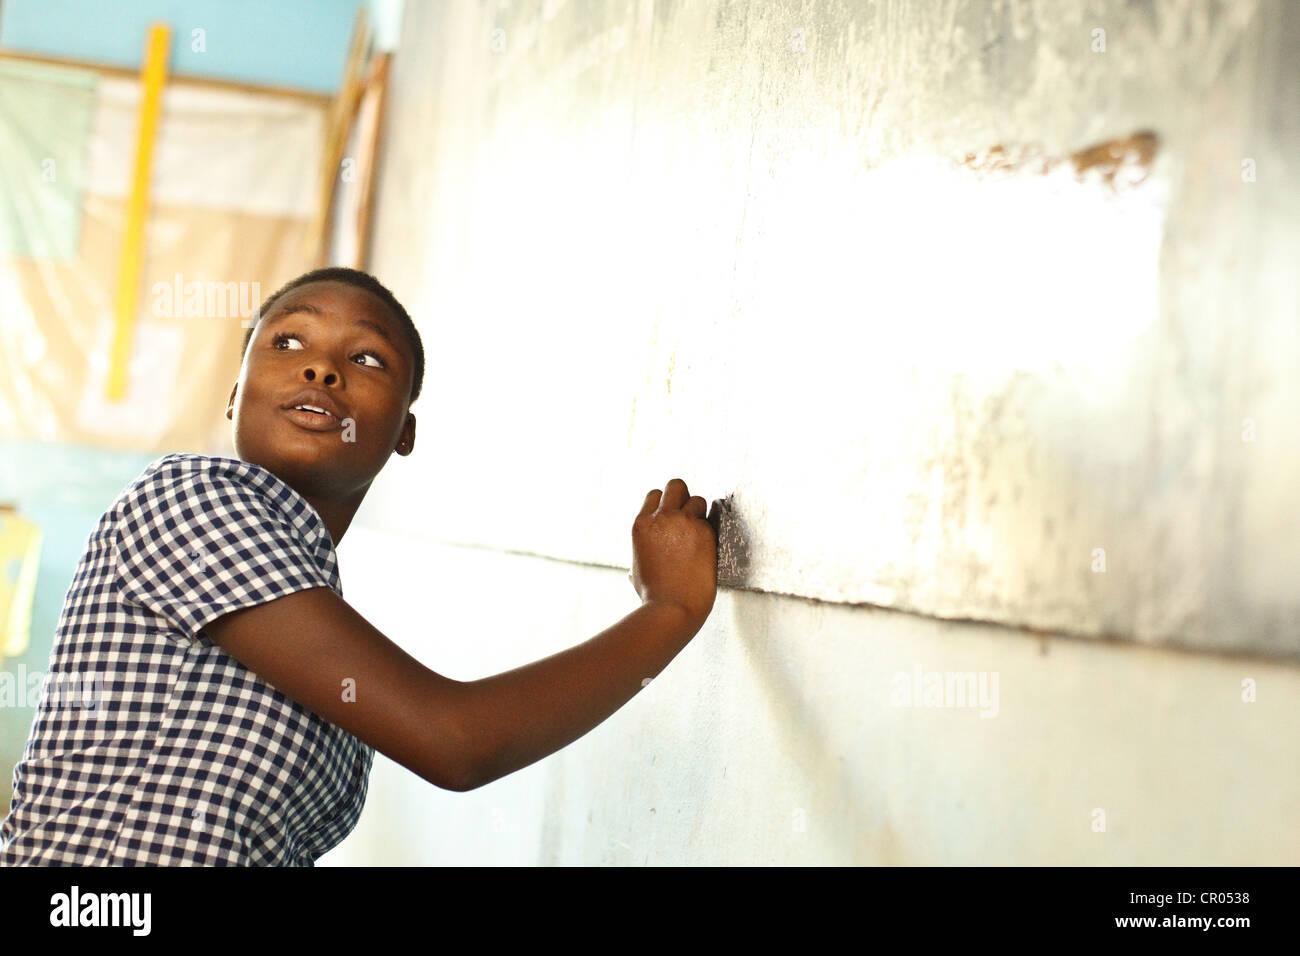 A girl writes on the blackboard during class at the groupe scolaire Bondoukou Est primary school in Bondoukou, Zanzan - Stock Image